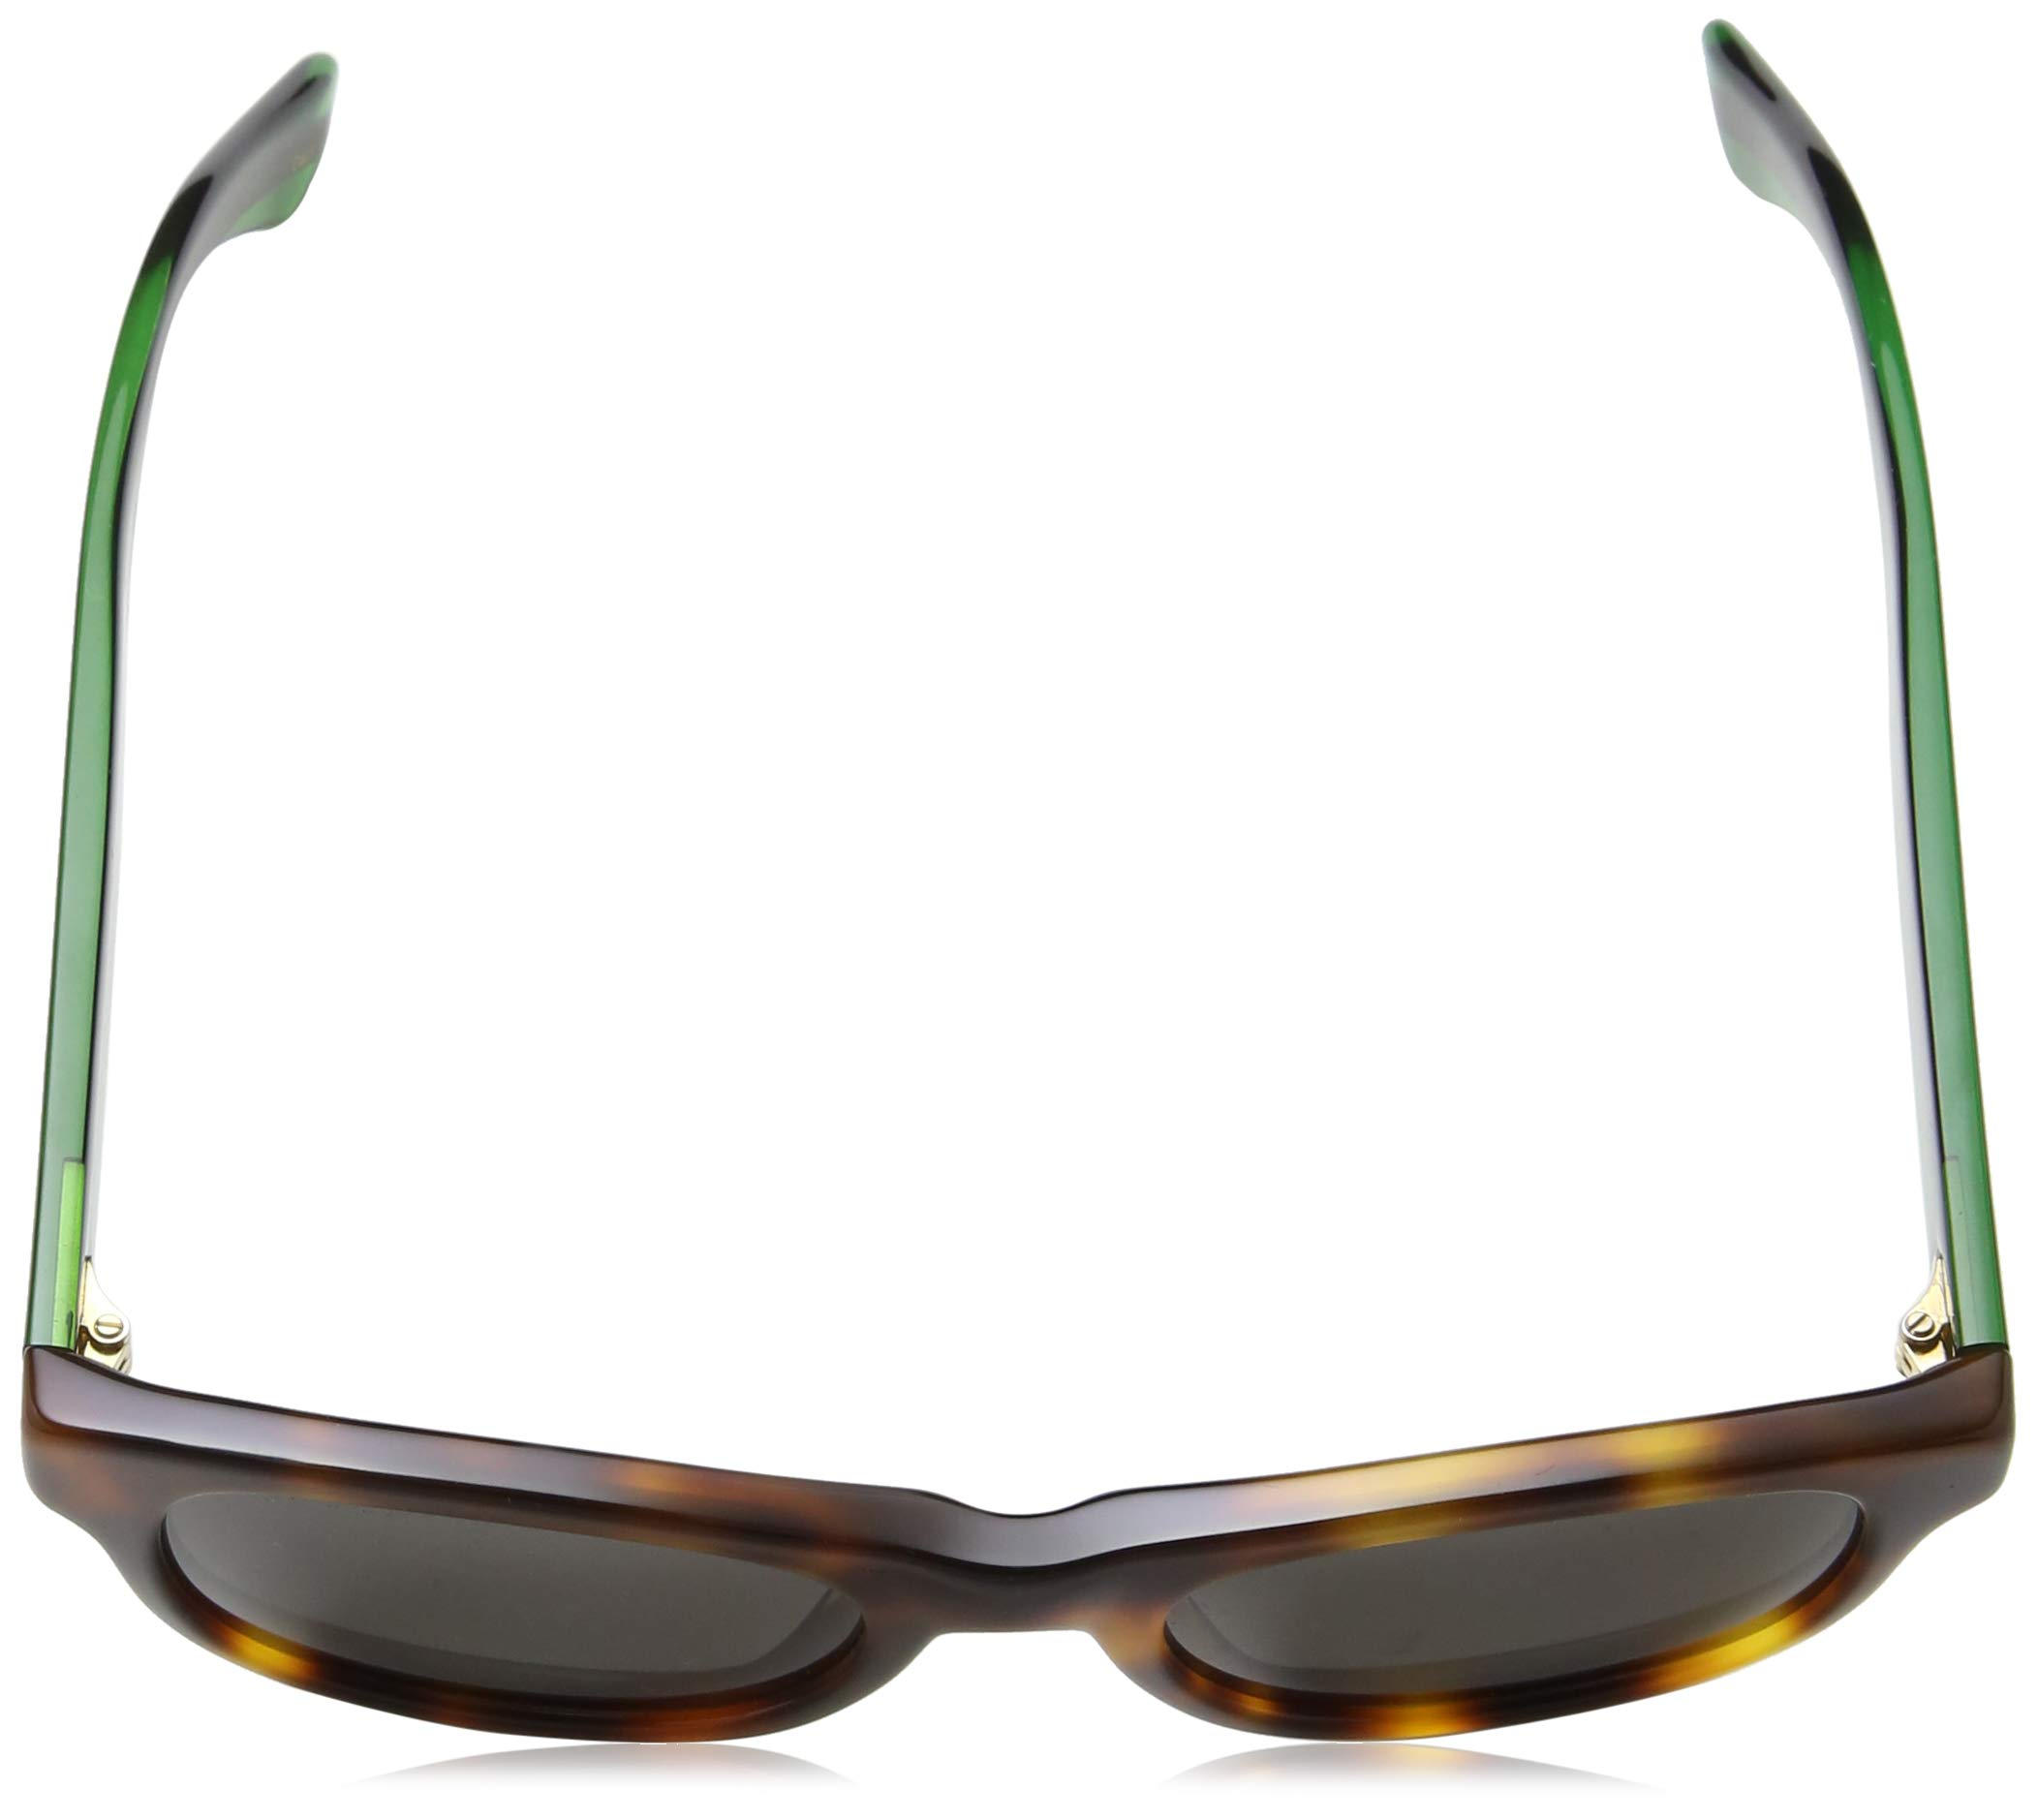 46427bc530 Gucci GG0003S Gafas de Sol, Avana-Green-Grey, 52 para Hombre ...